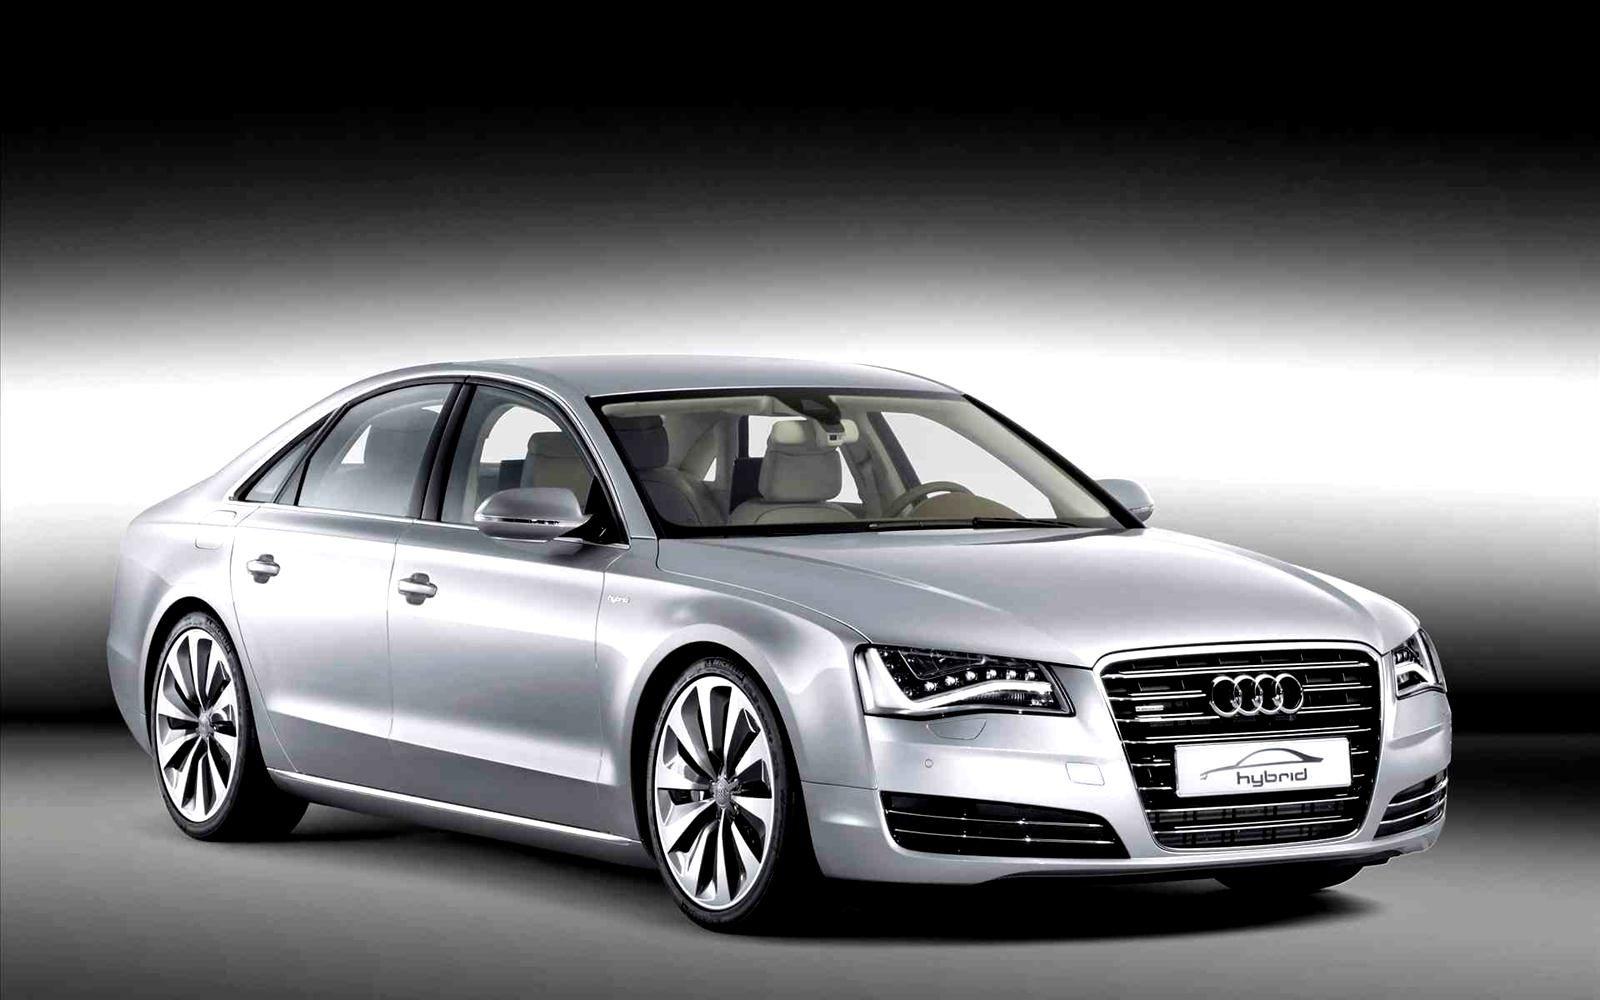 2011 Audi A8 Hybrid Cool Car Wallpapers Audi A8 Audi Cars Audi